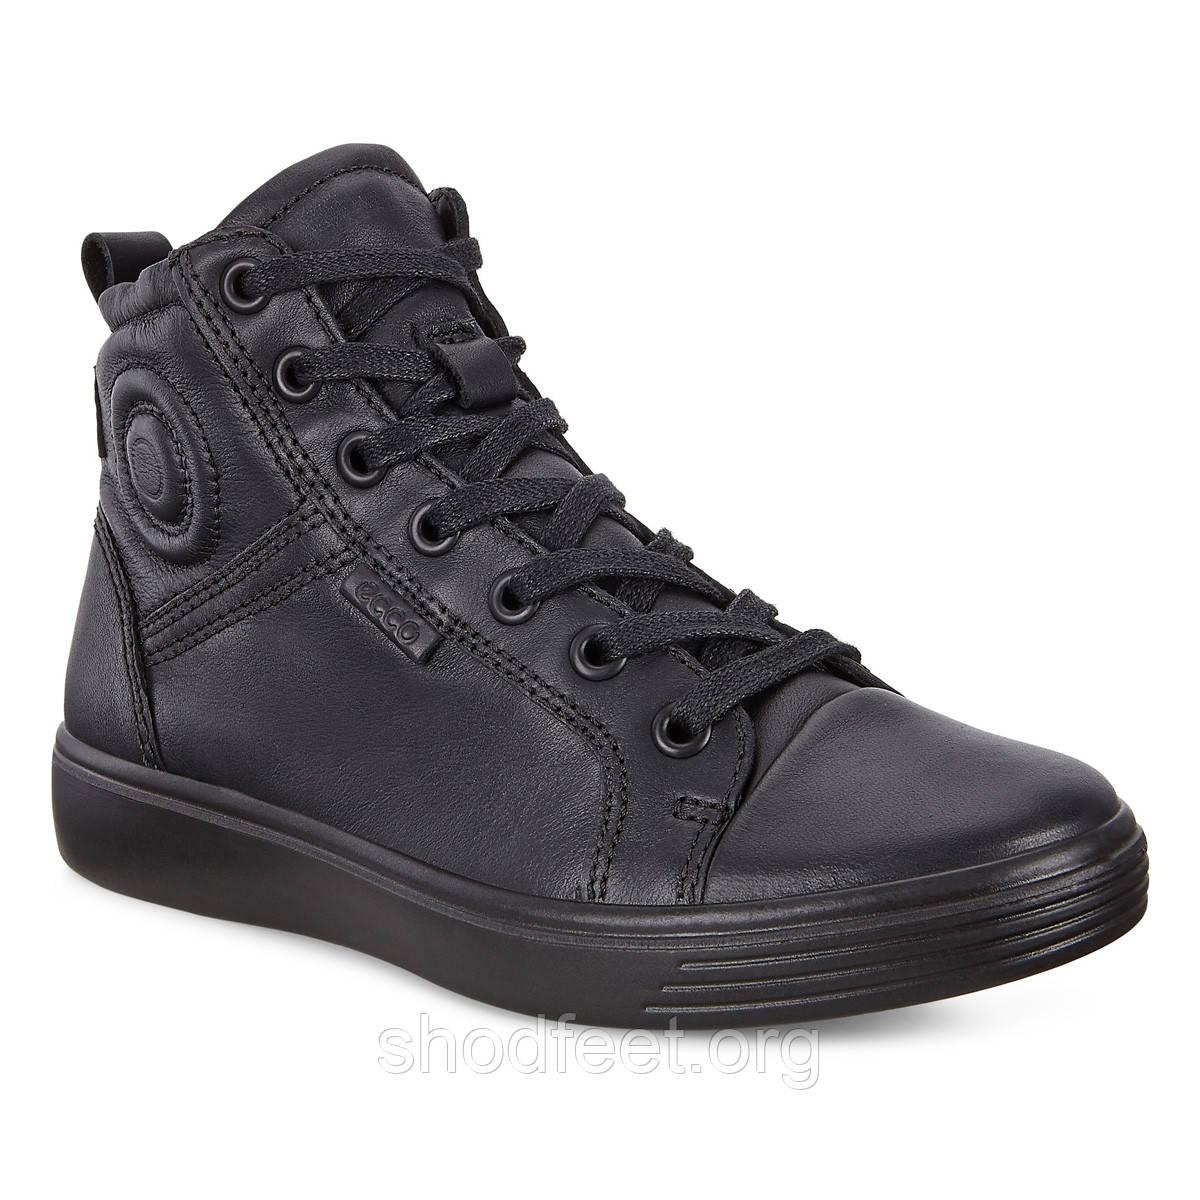 Подростковые ботинки Ecco S7 Teen Gore-Tex 780293-11001